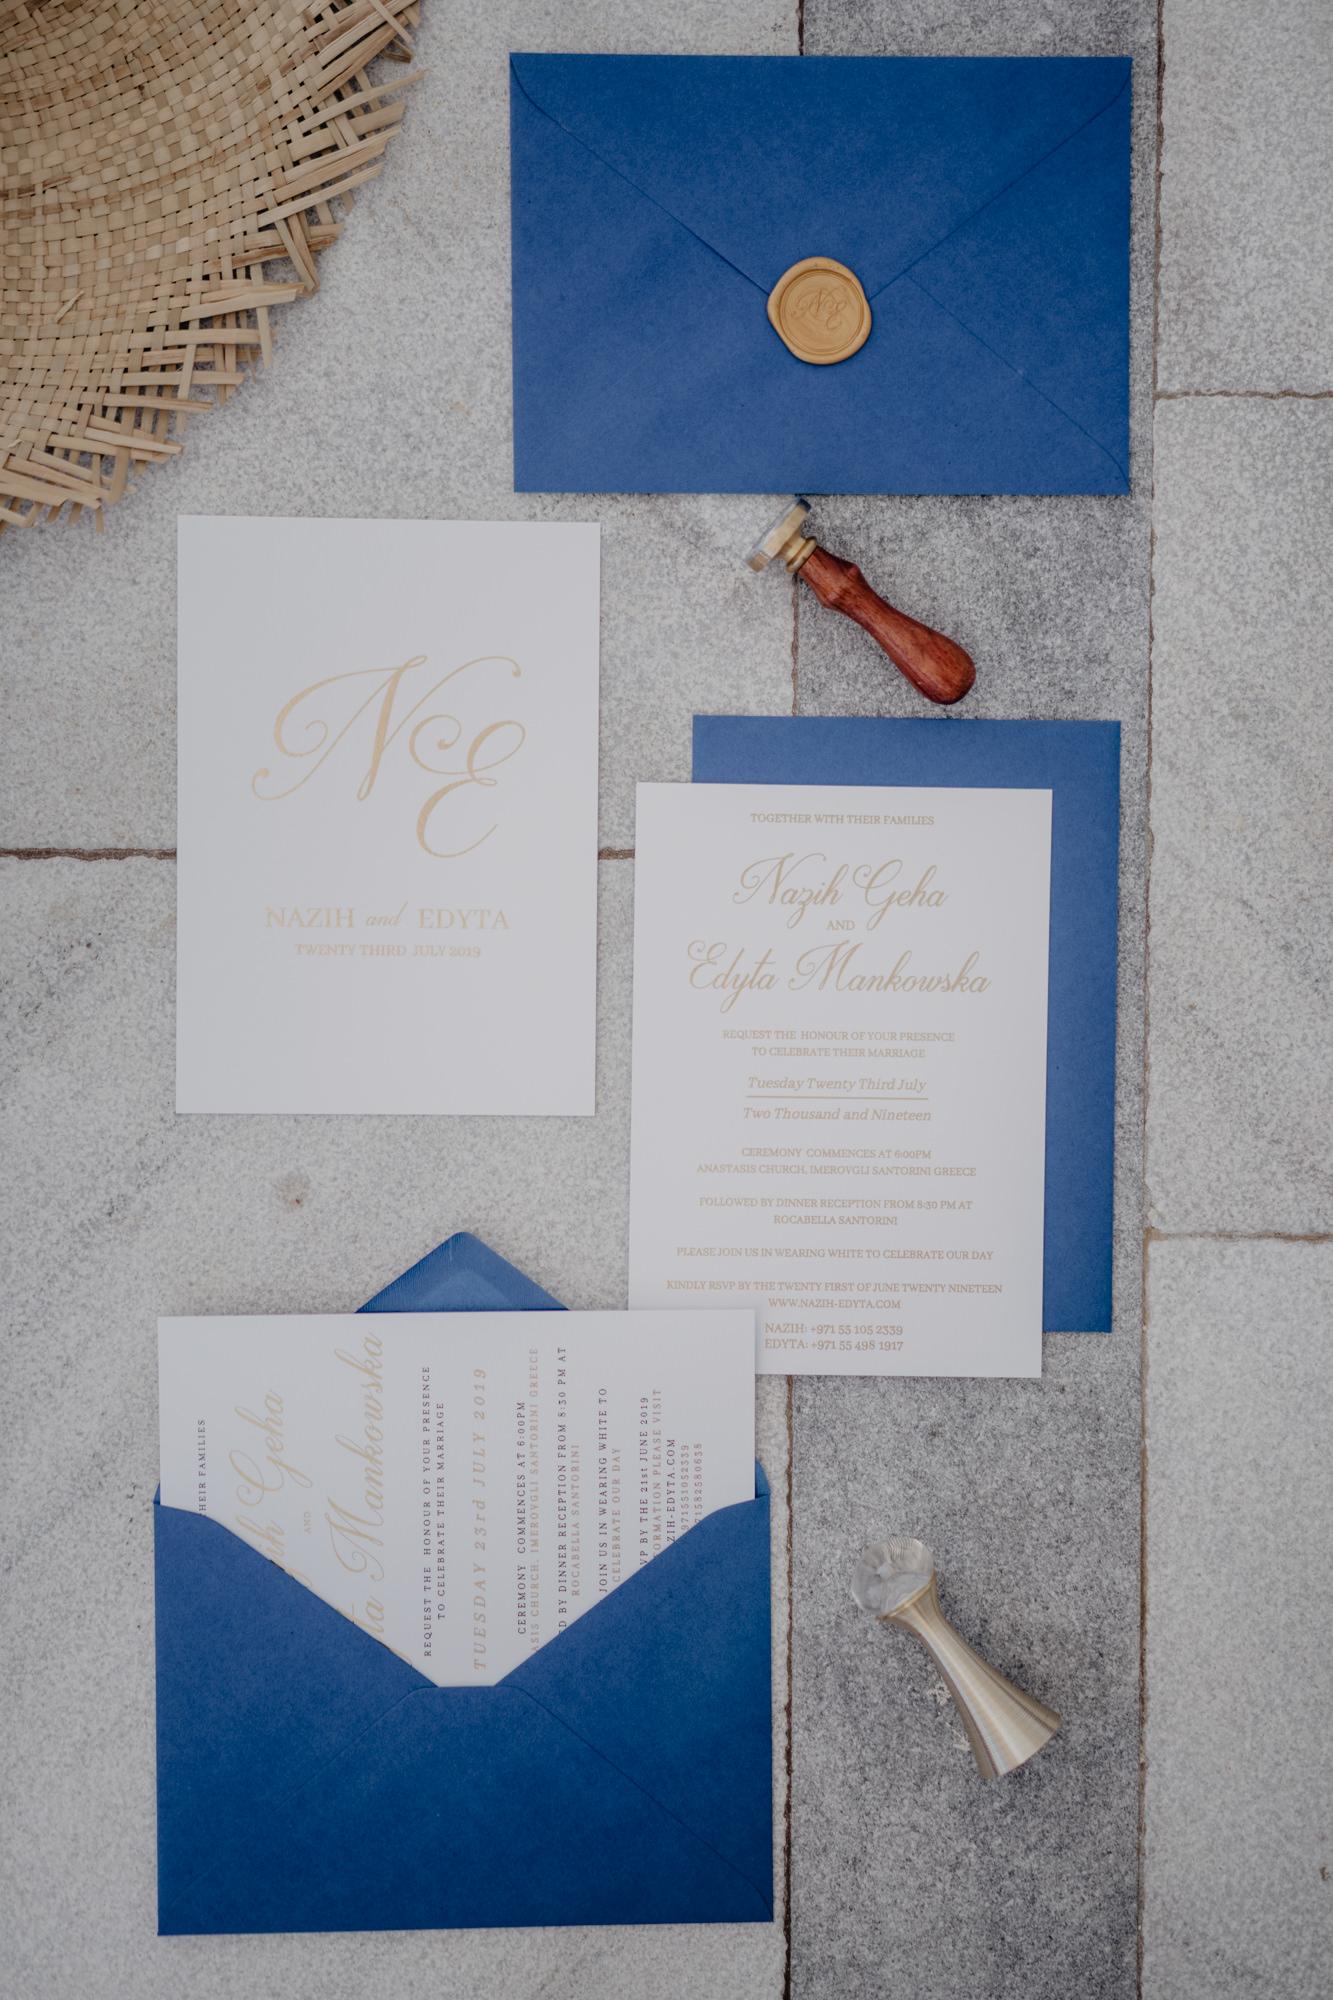 Denim blue wedding invitations with gold calligraphy - photo by David Bastianoni